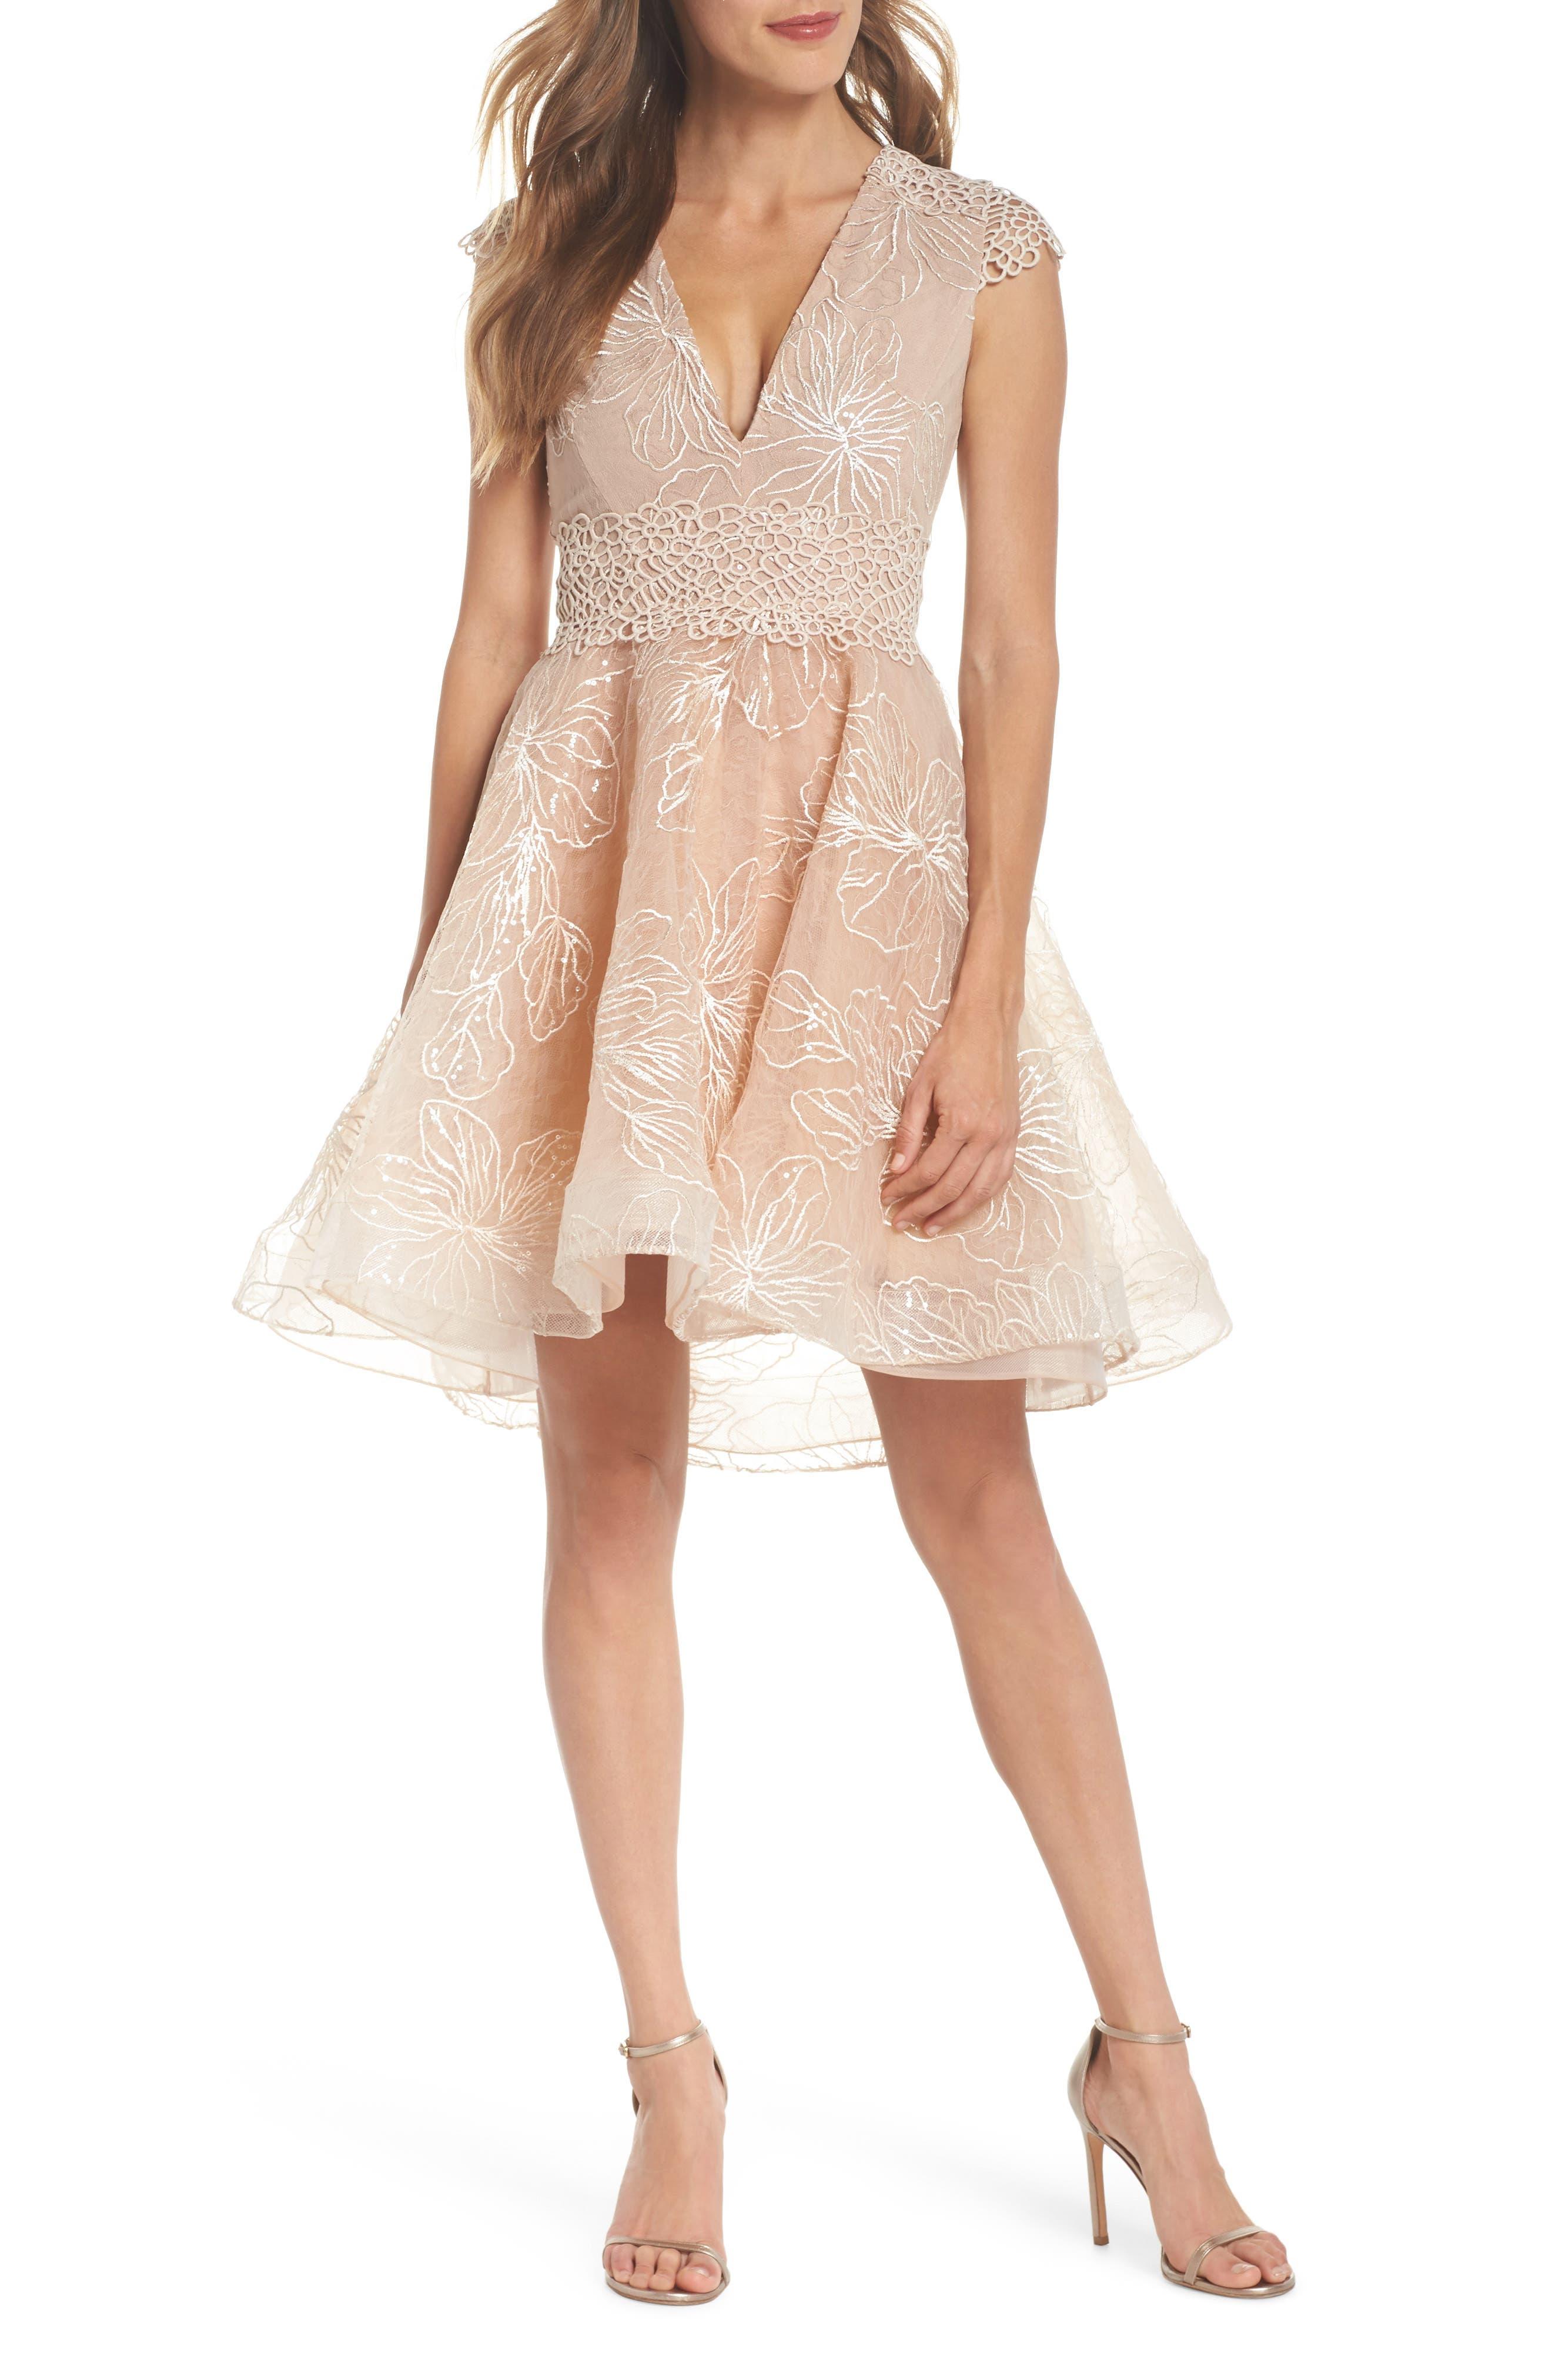 Fiore Sequin Fit & Flare Dress,                             Main thumbnail 1, color,                             Beige